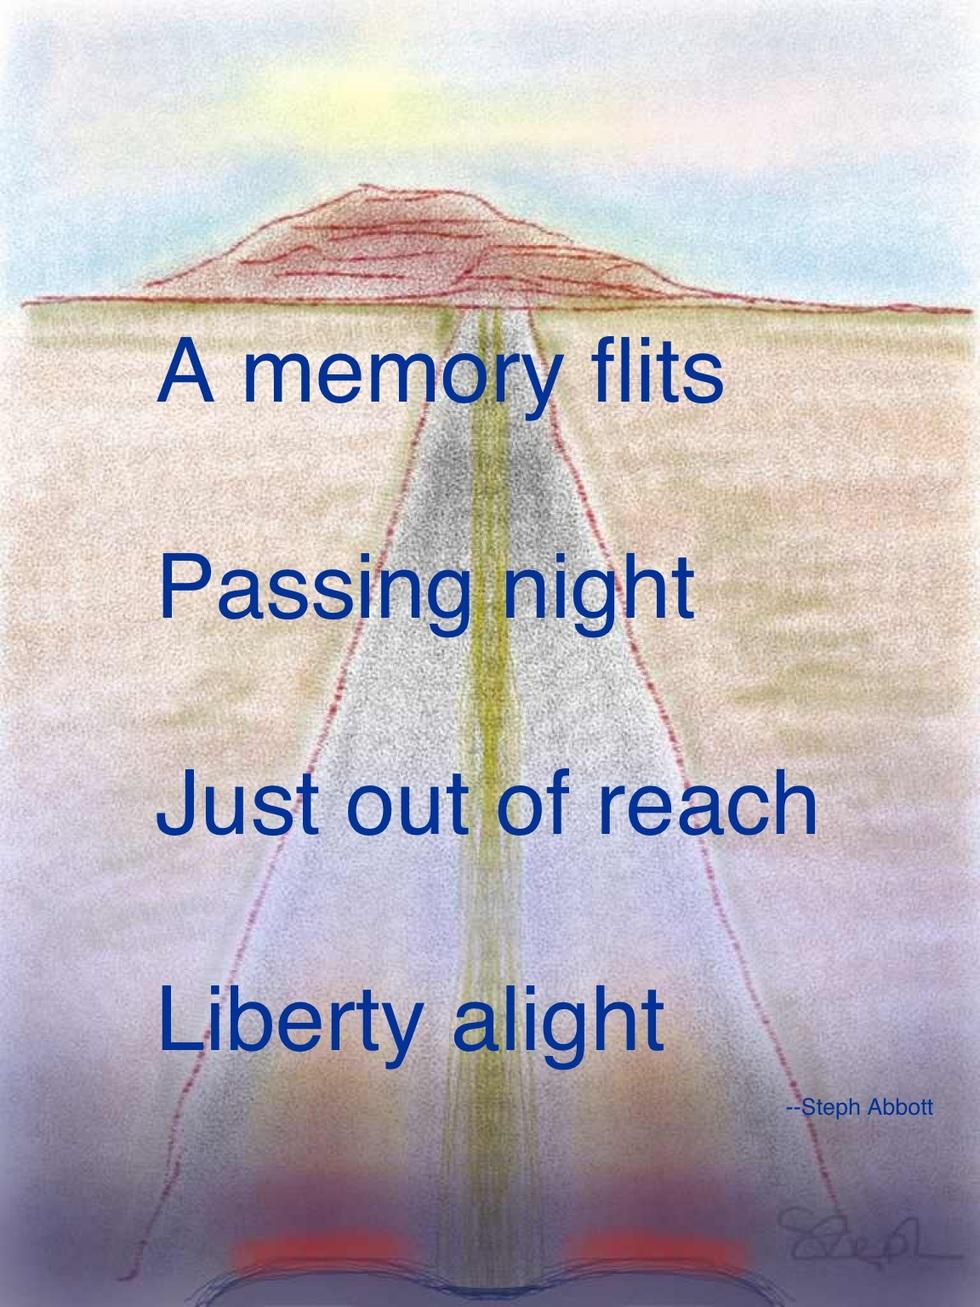 Steph_abbott-a_memory_flits